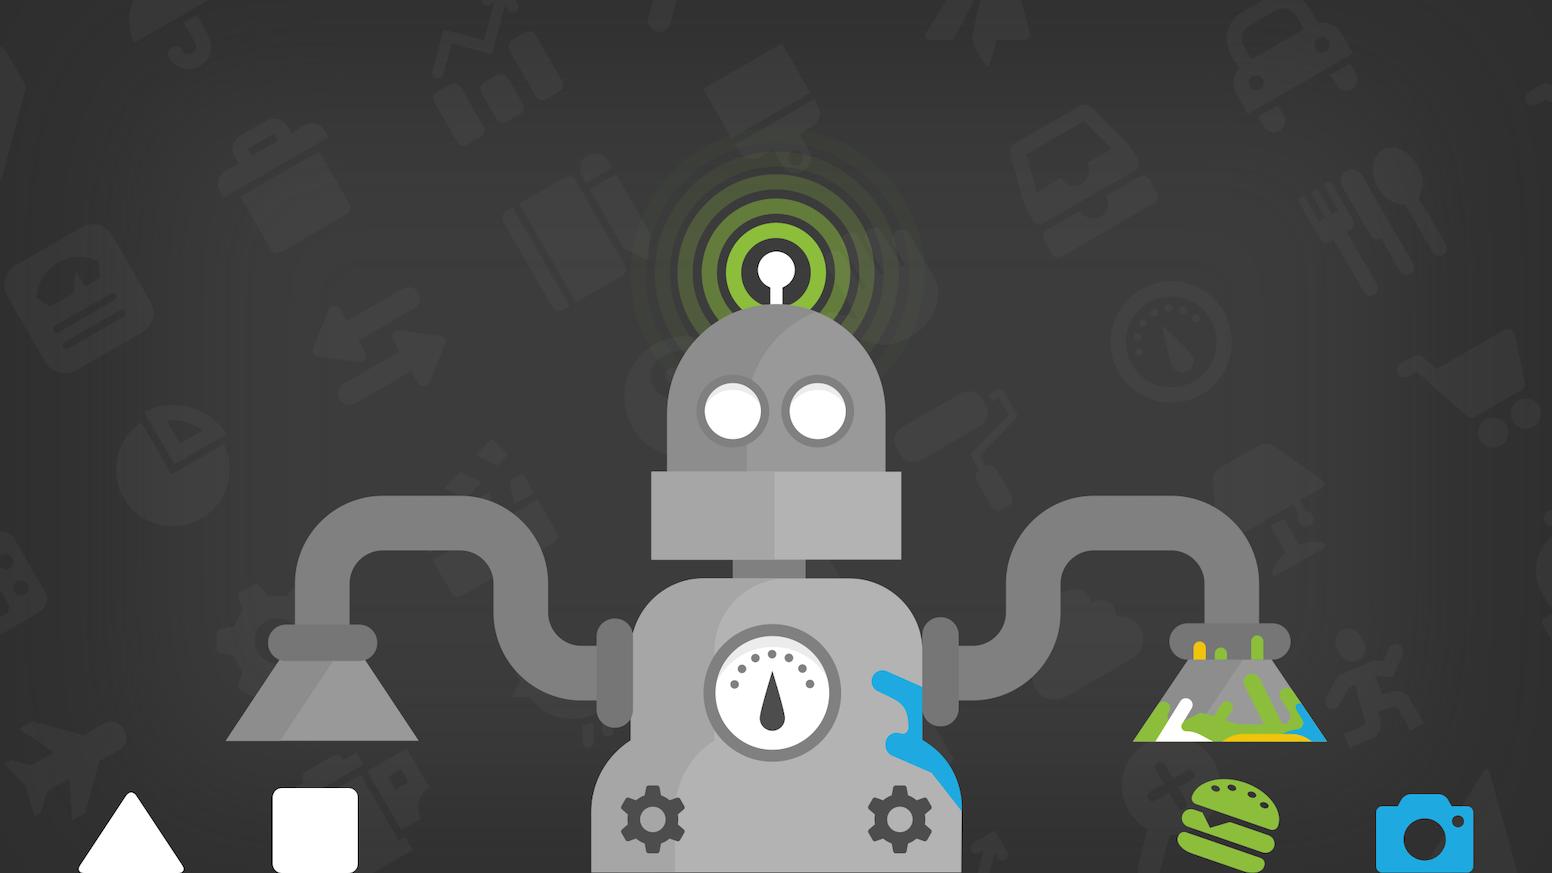 Symbolicons Pro: Your Friendly, Versatile, Go-to Icon Set